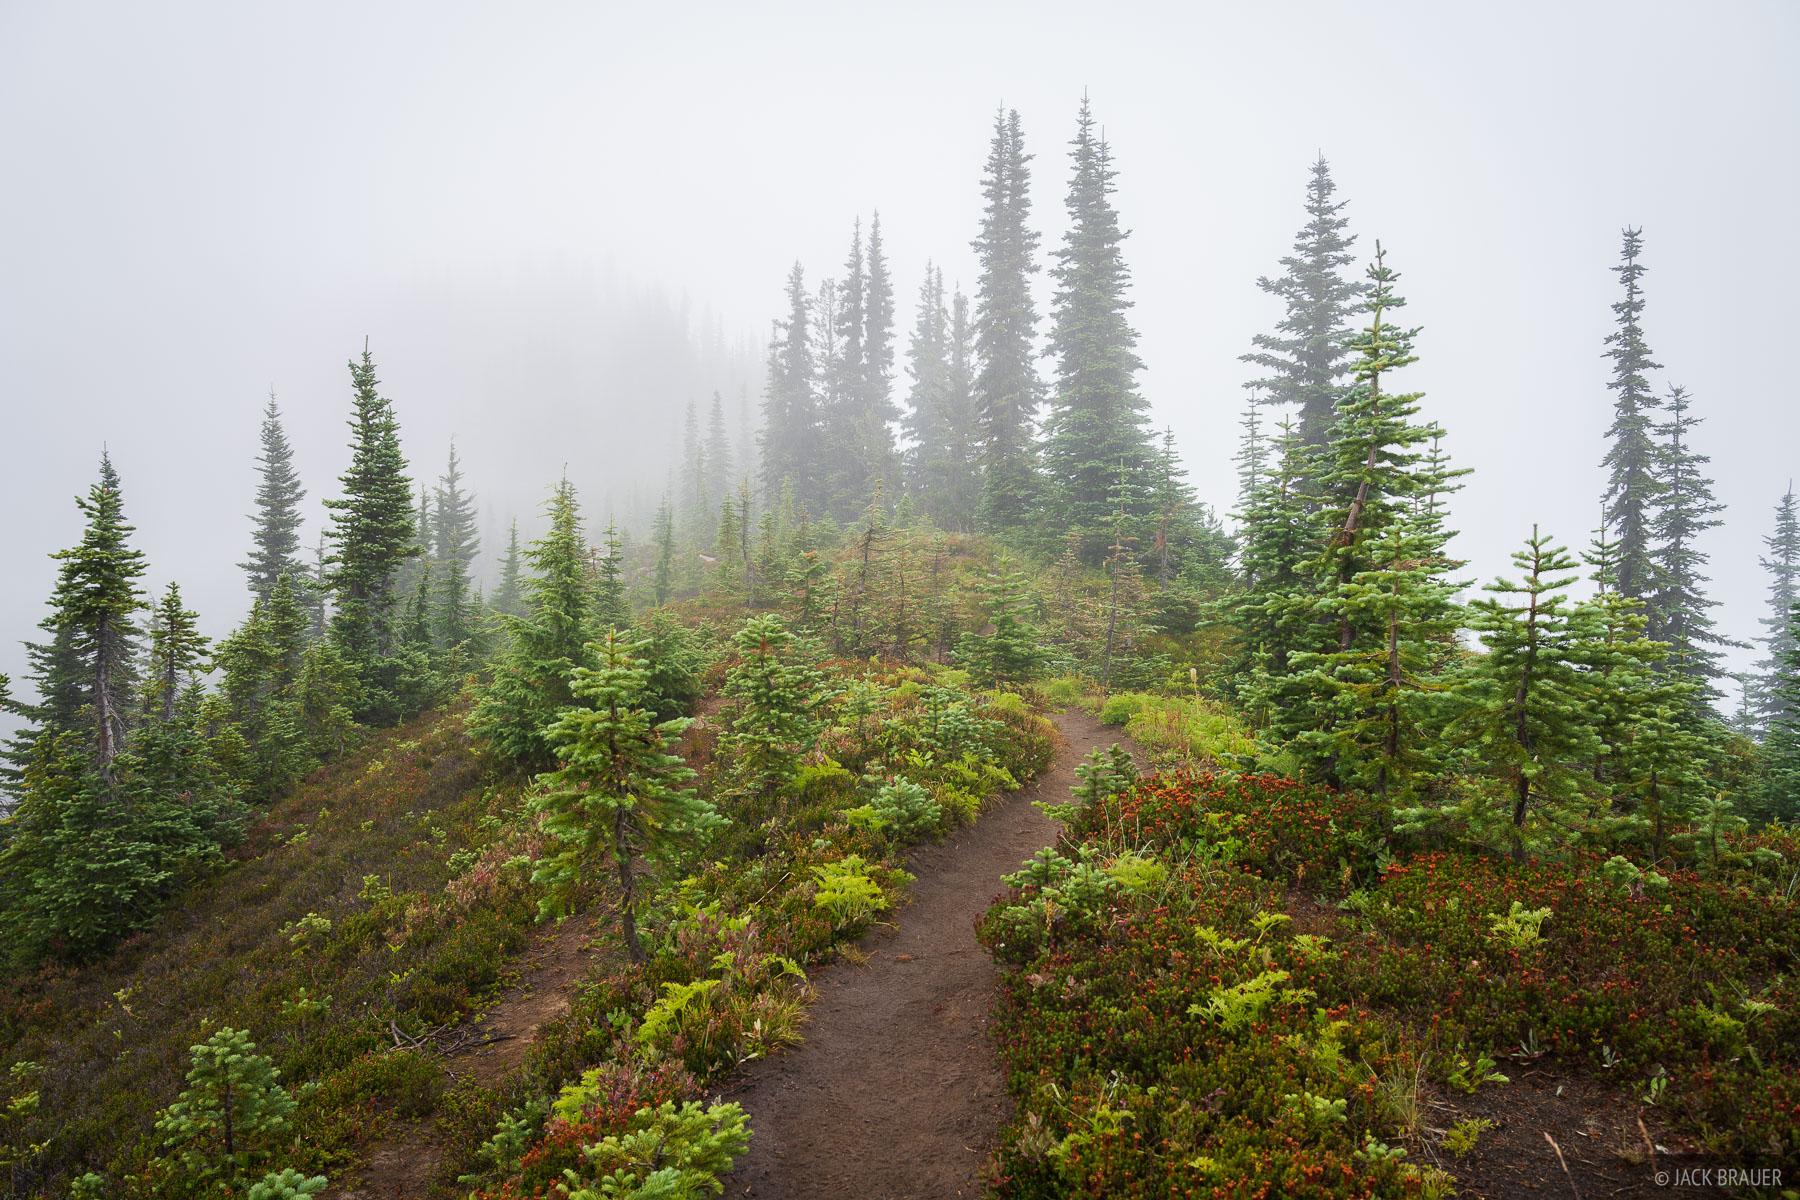 Rainy, misty weather atop Miners Ridge.